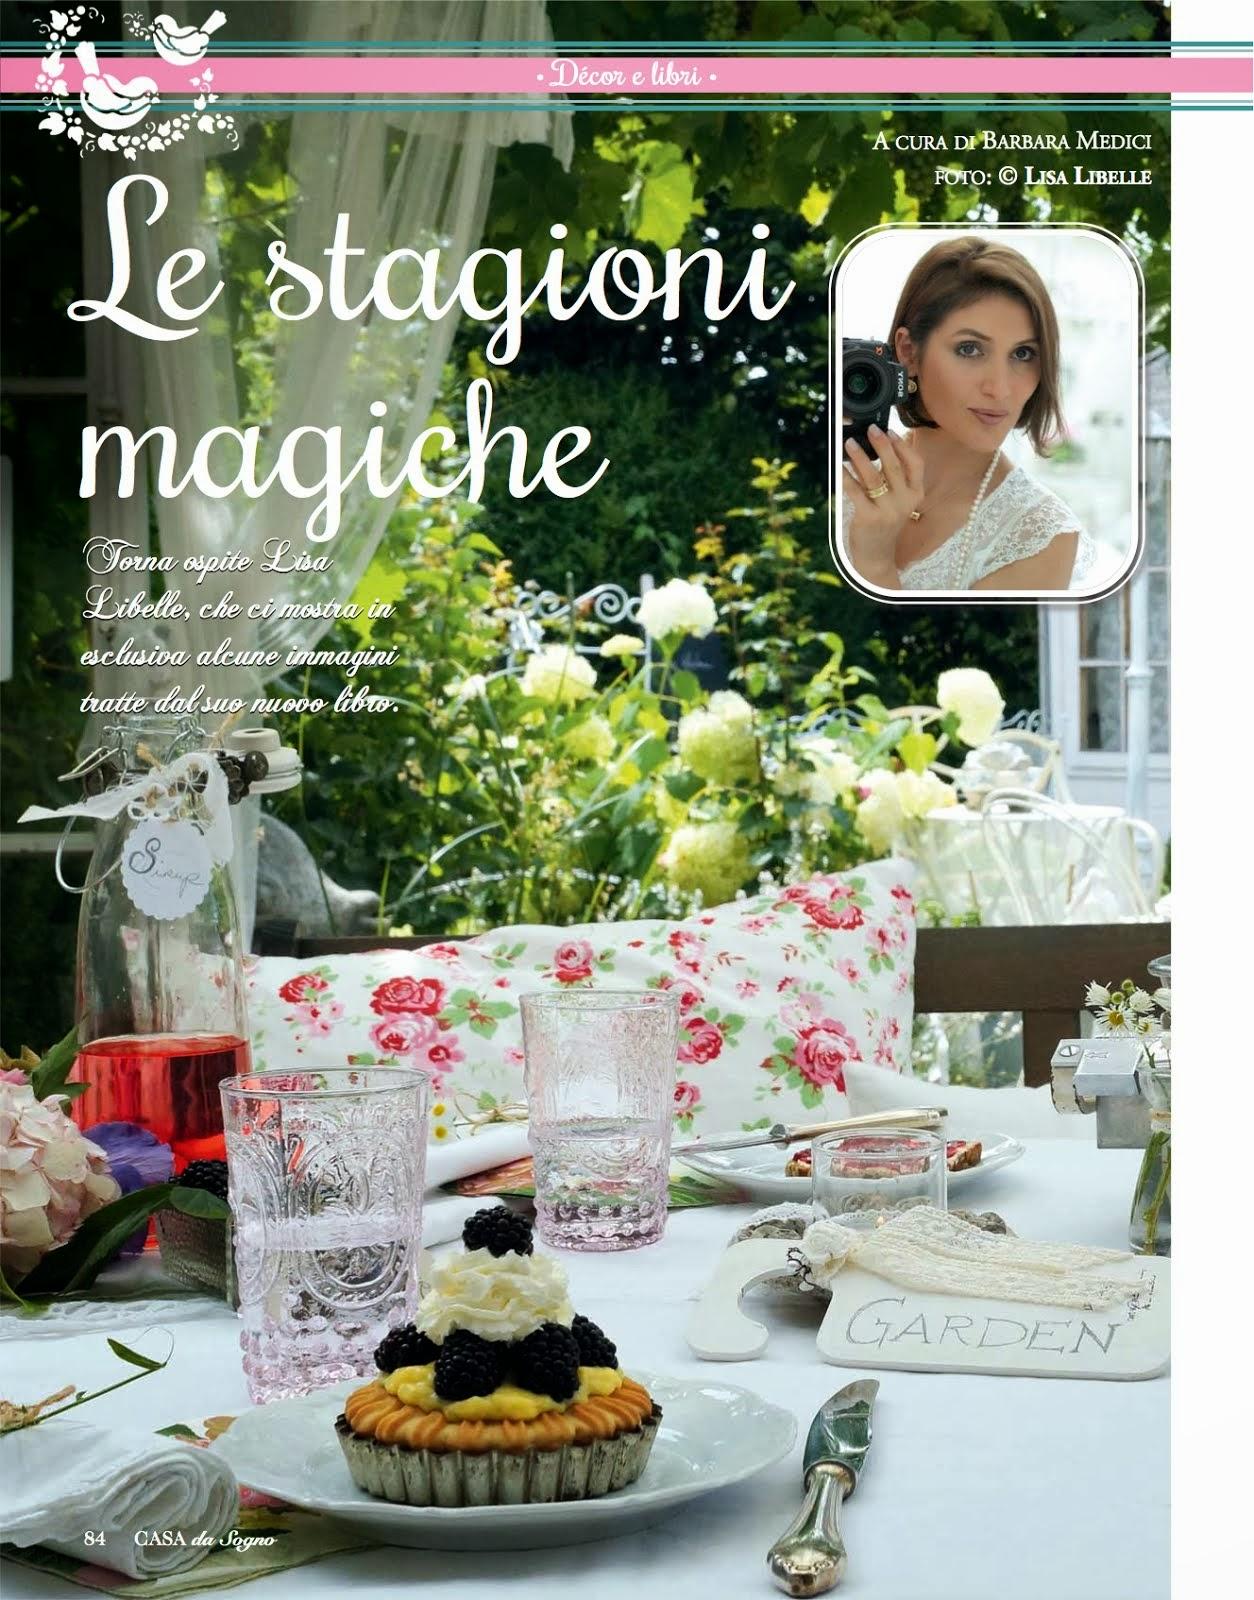 Zauberhafte Jahreszeiten - Le stagioni magiche featured in Italy